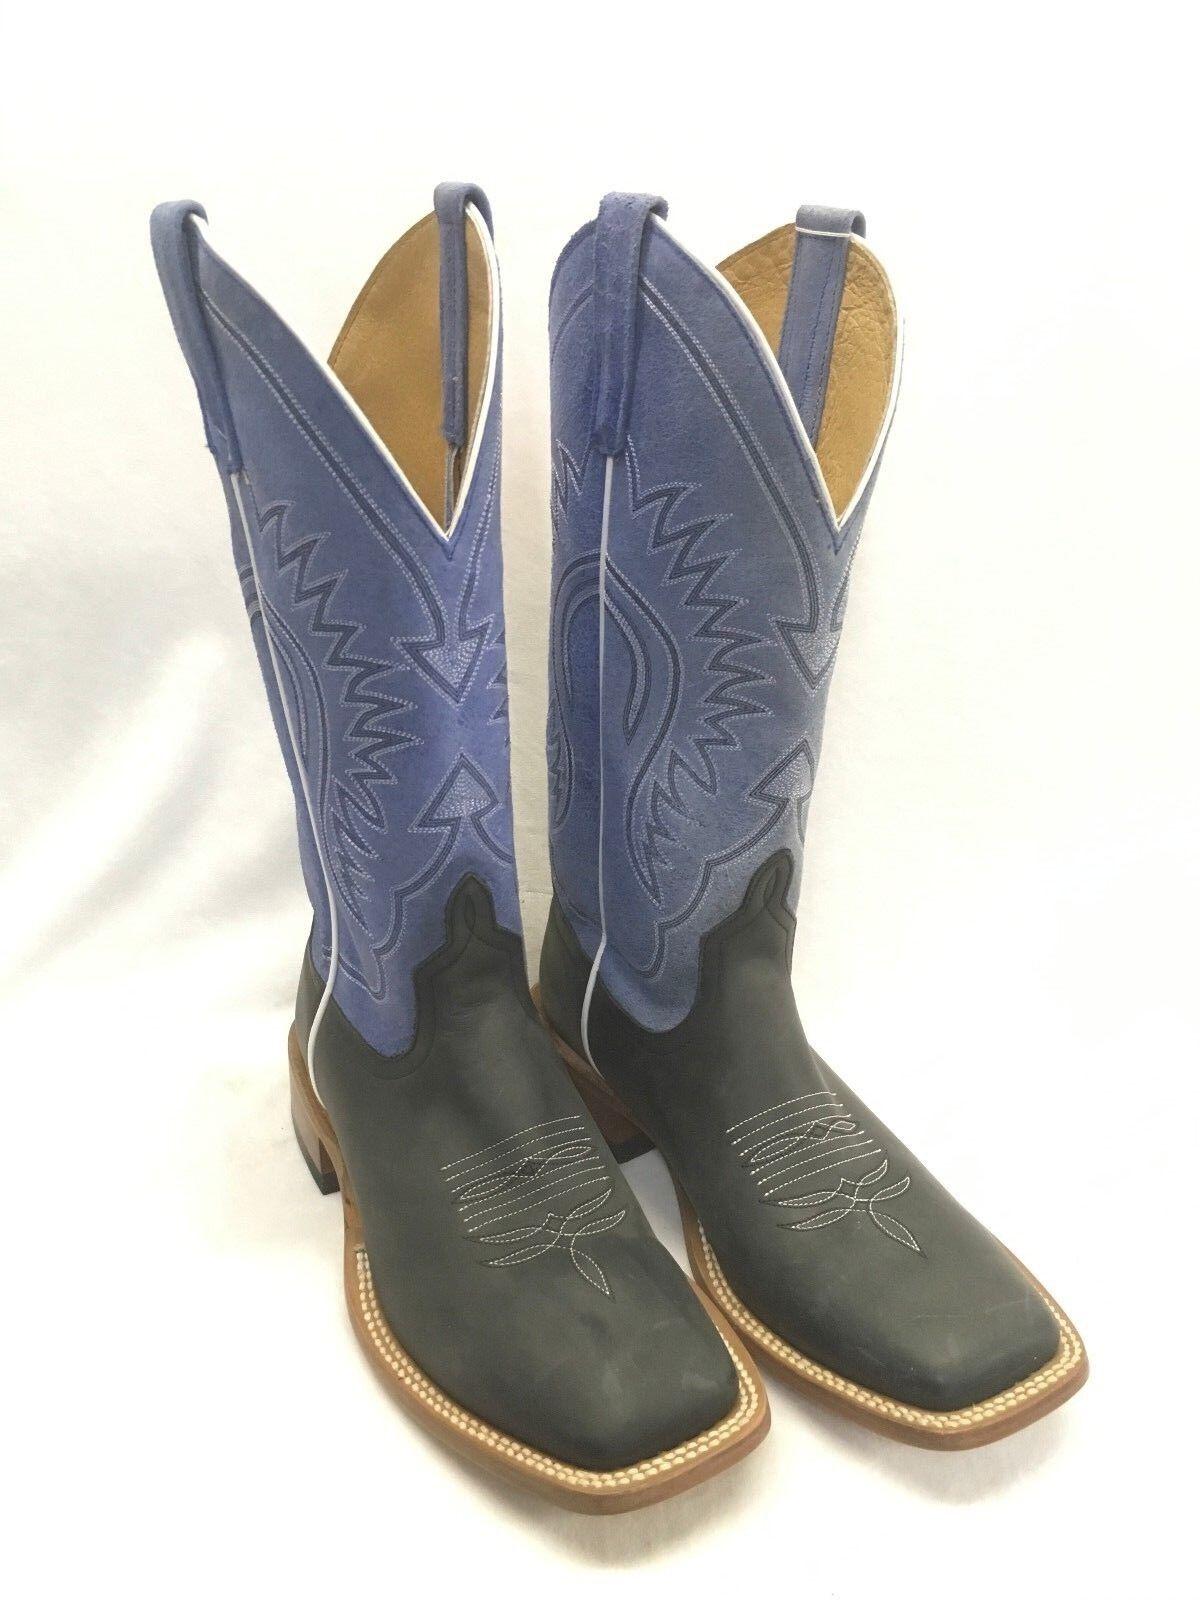 botas para hombre Horsepower by AB-Negro Puntera Cuadrada Crazy Caballo Con Azul Superior, HP1080